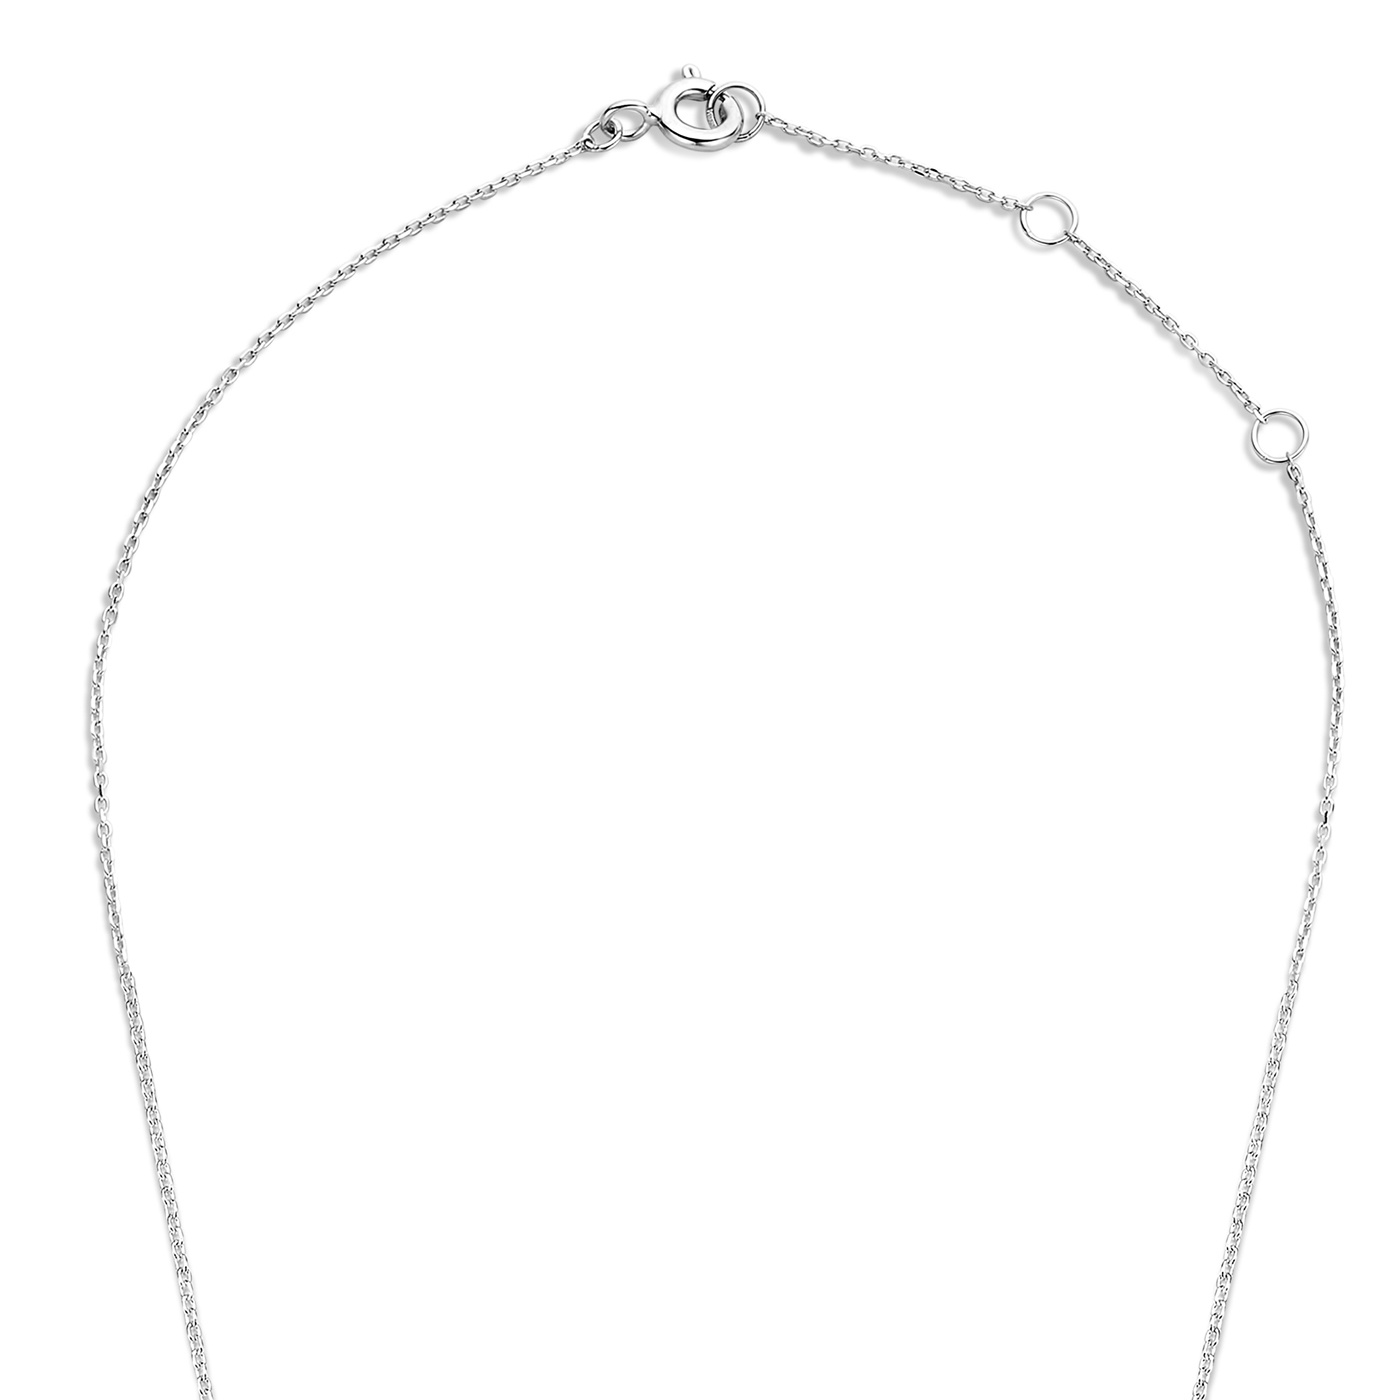 Isabel Bernard Collana con zircone in oro bianco 14 carati Saint Germain Hélione